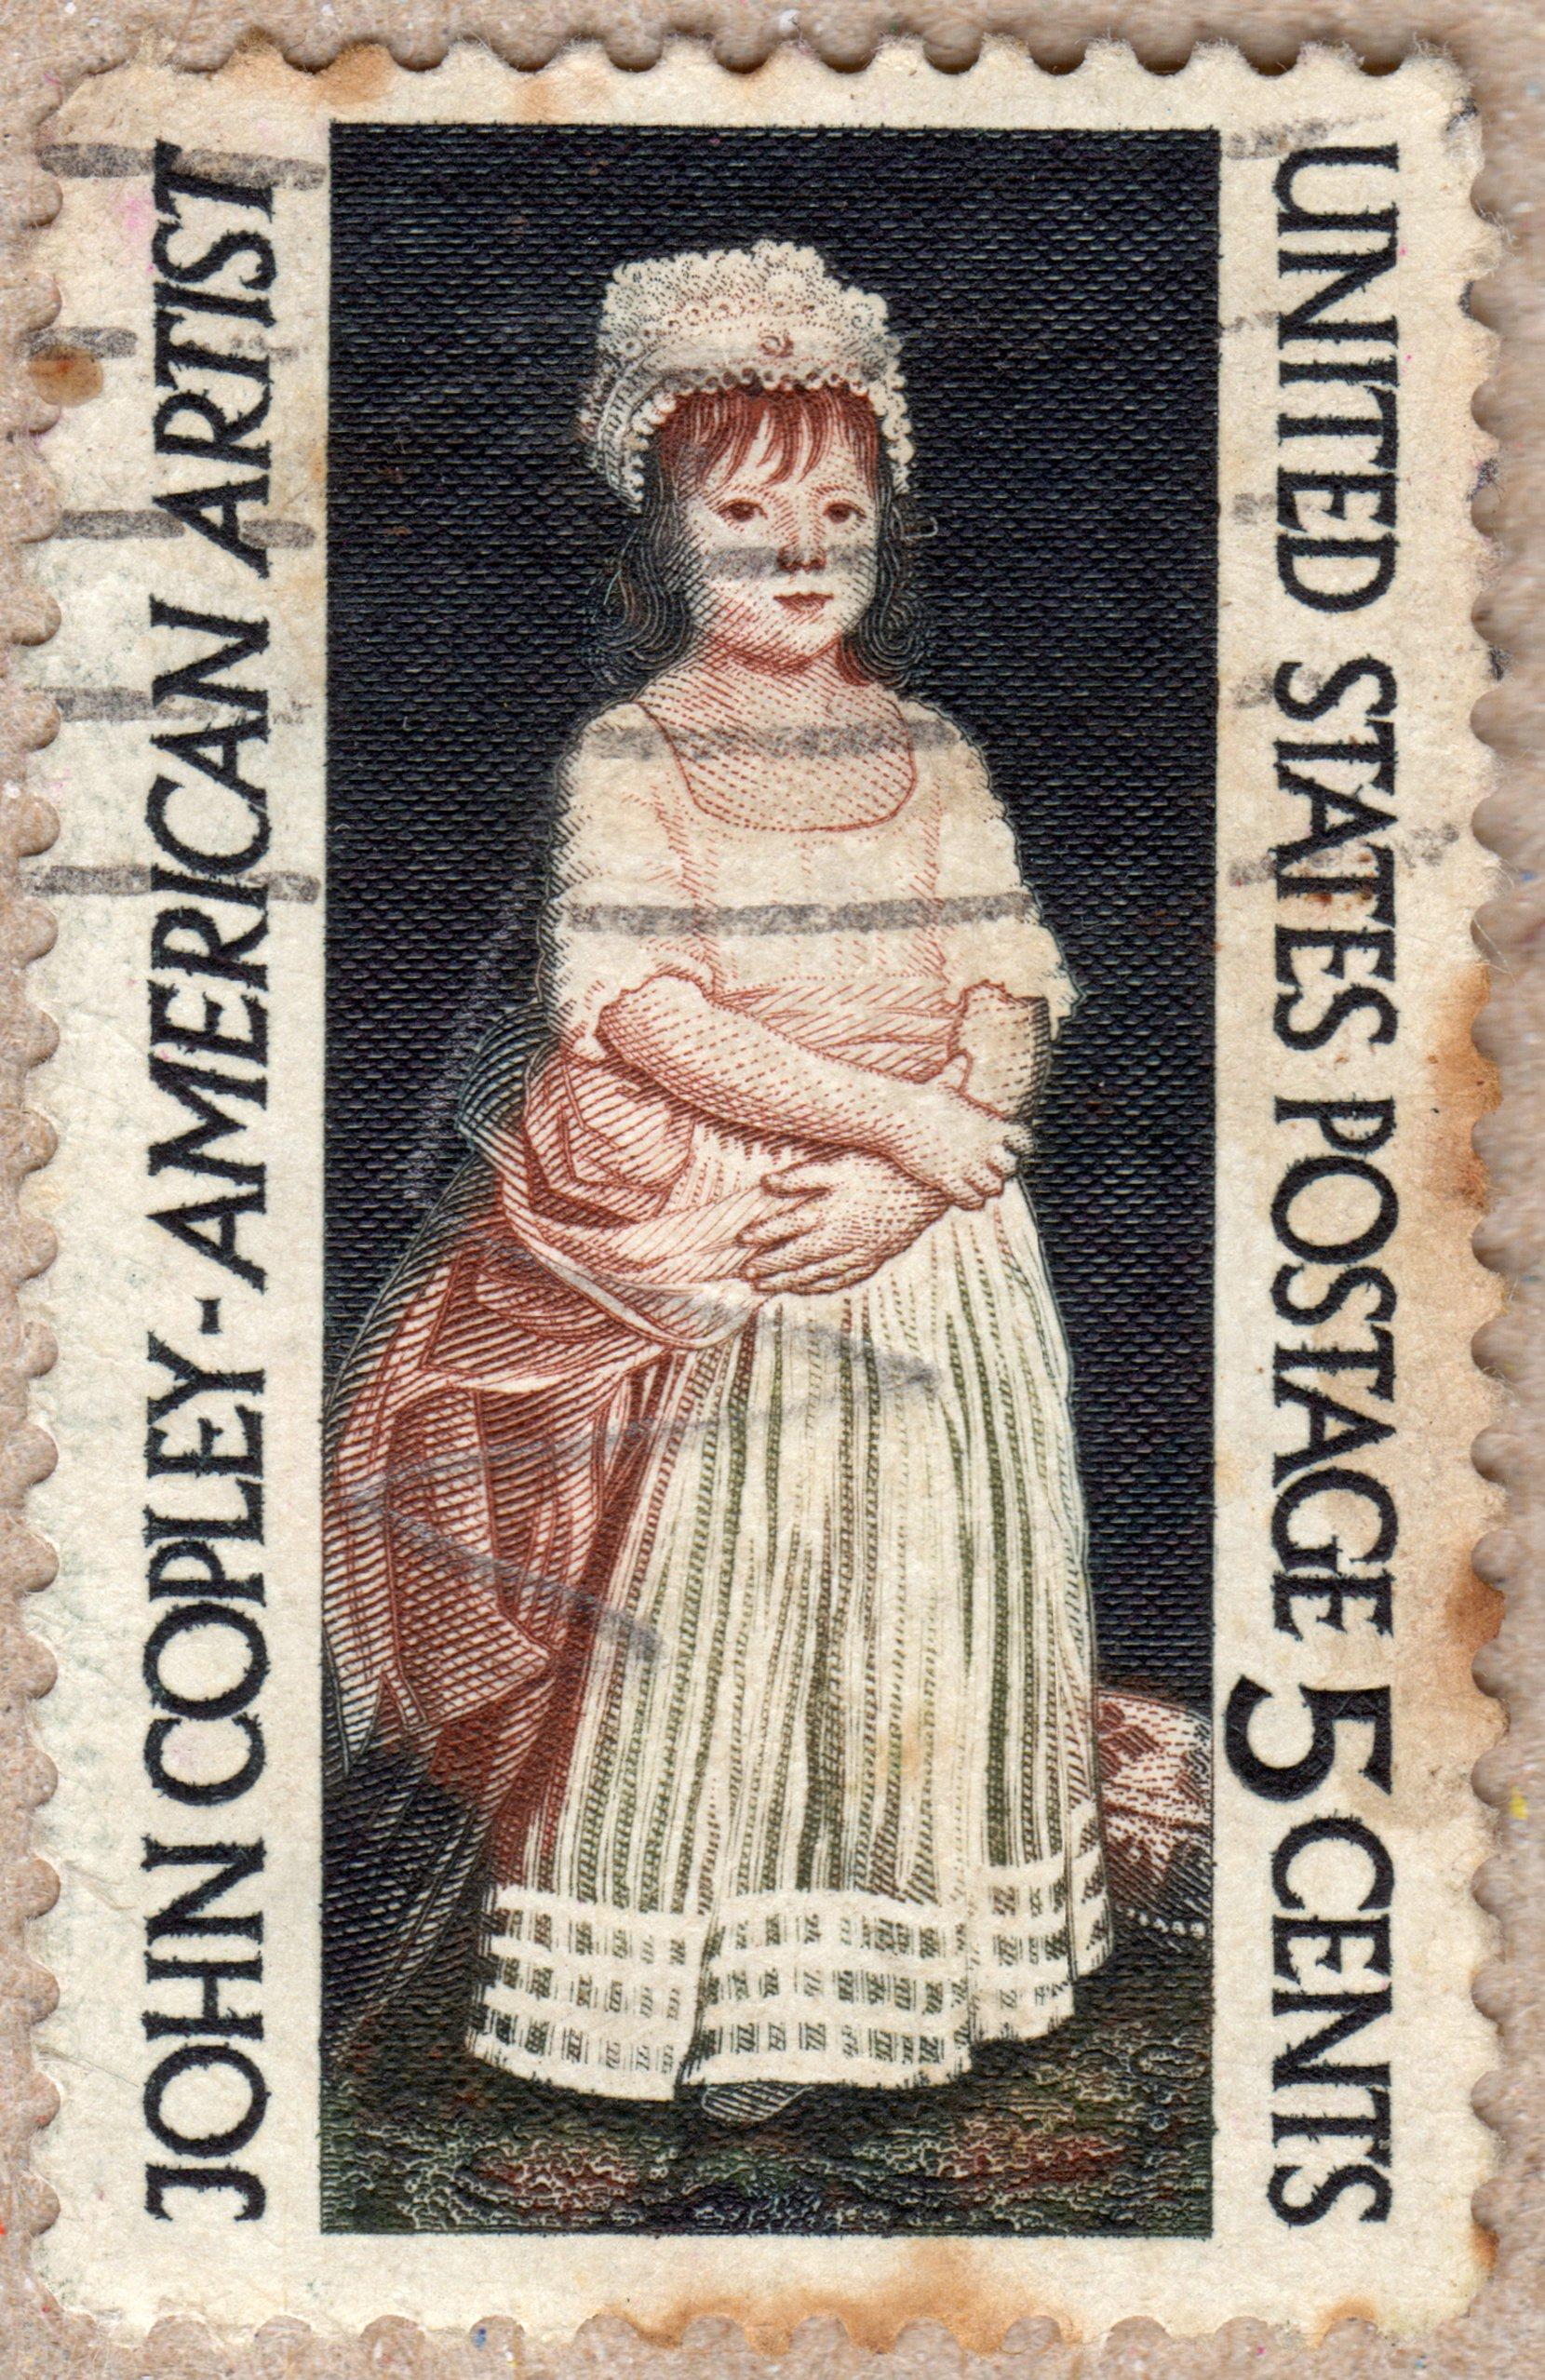 john copley - american artist,  u.s. 5¢ stamp philately postage stamps